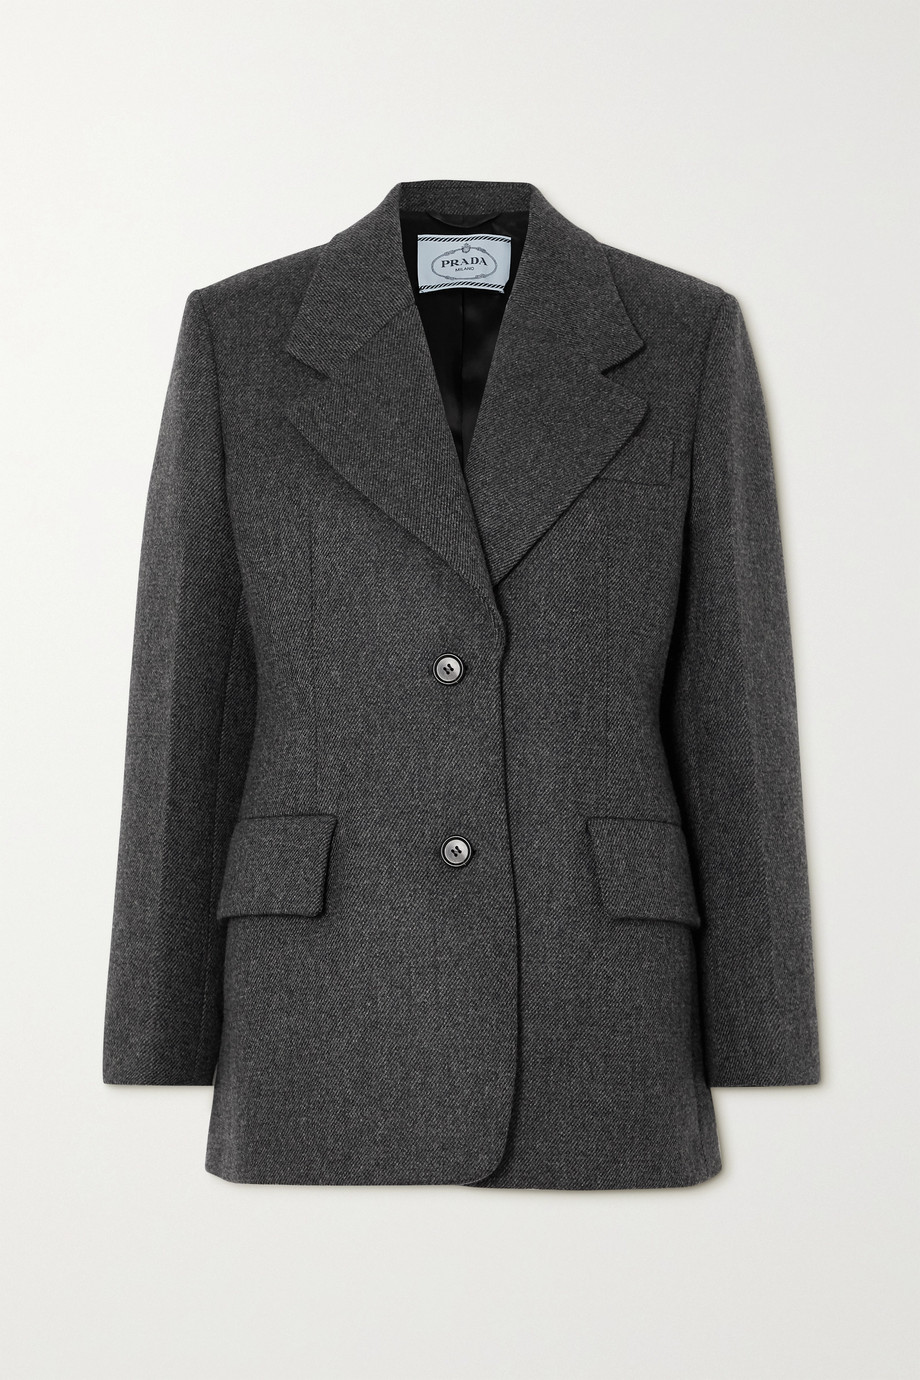 Prada Wool-twill blazer